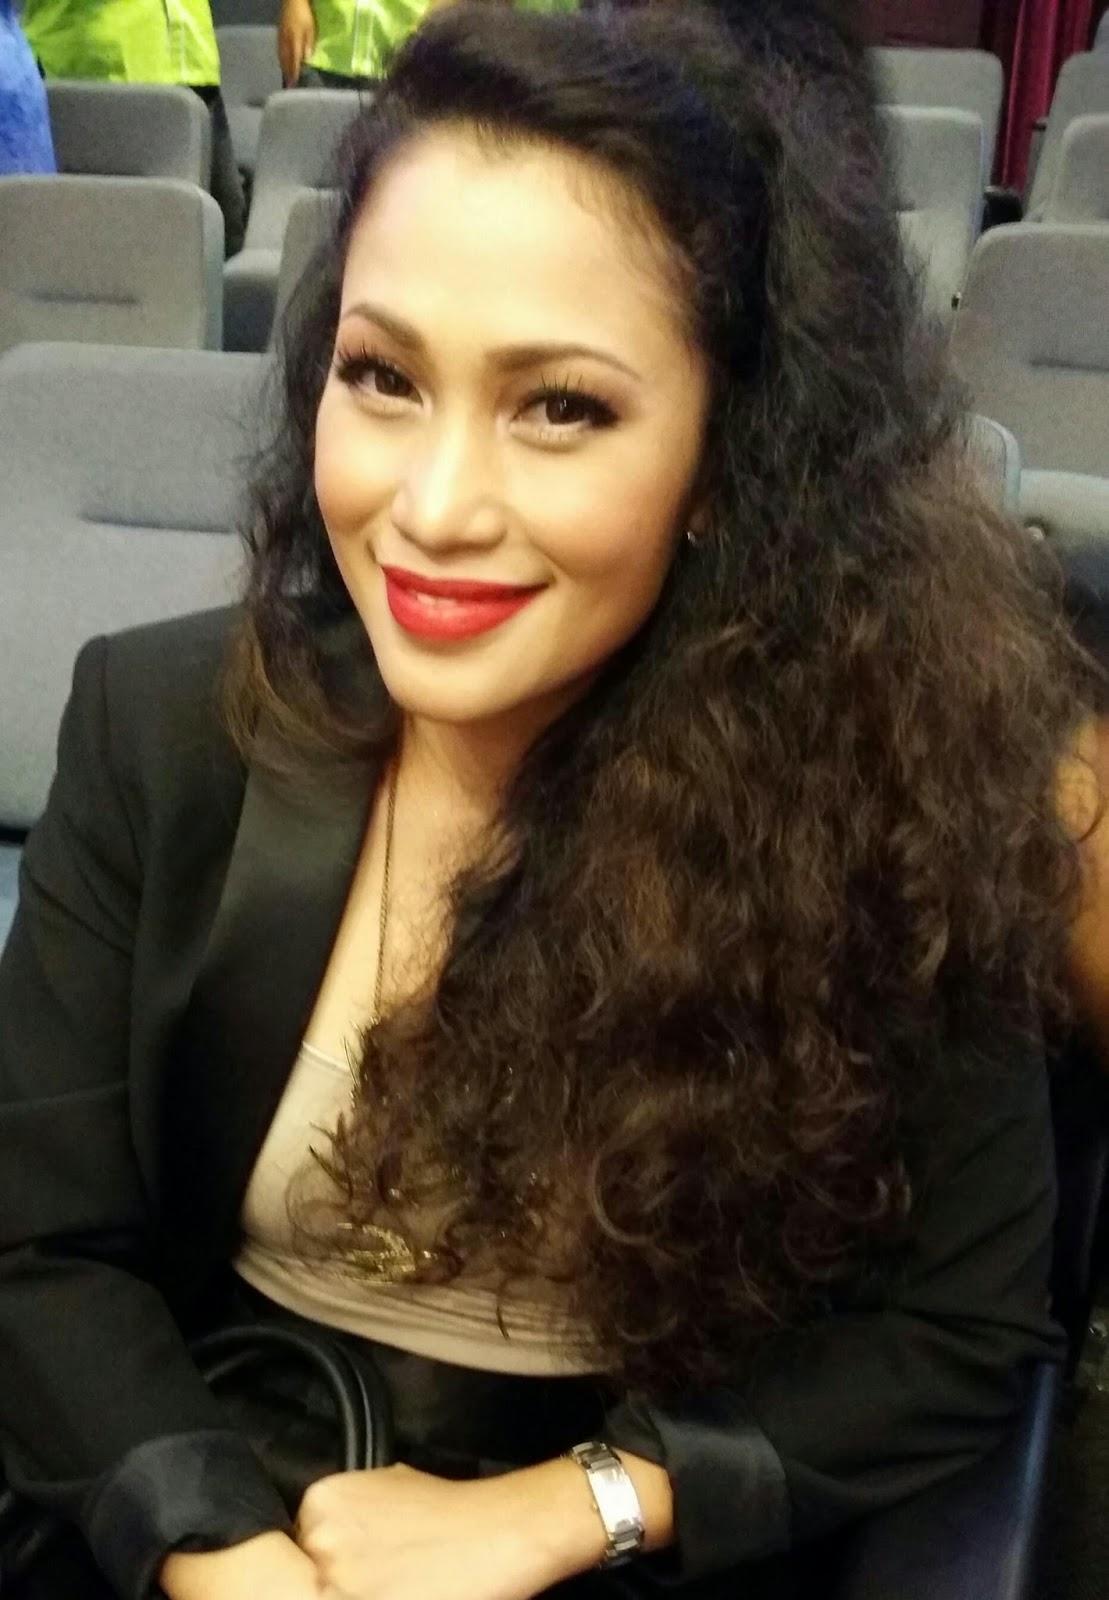 Penyanyi Ezlynn Akui Teringin Timang Cahayamata, info, terkini, hiburan, sensasi, Ezlynn